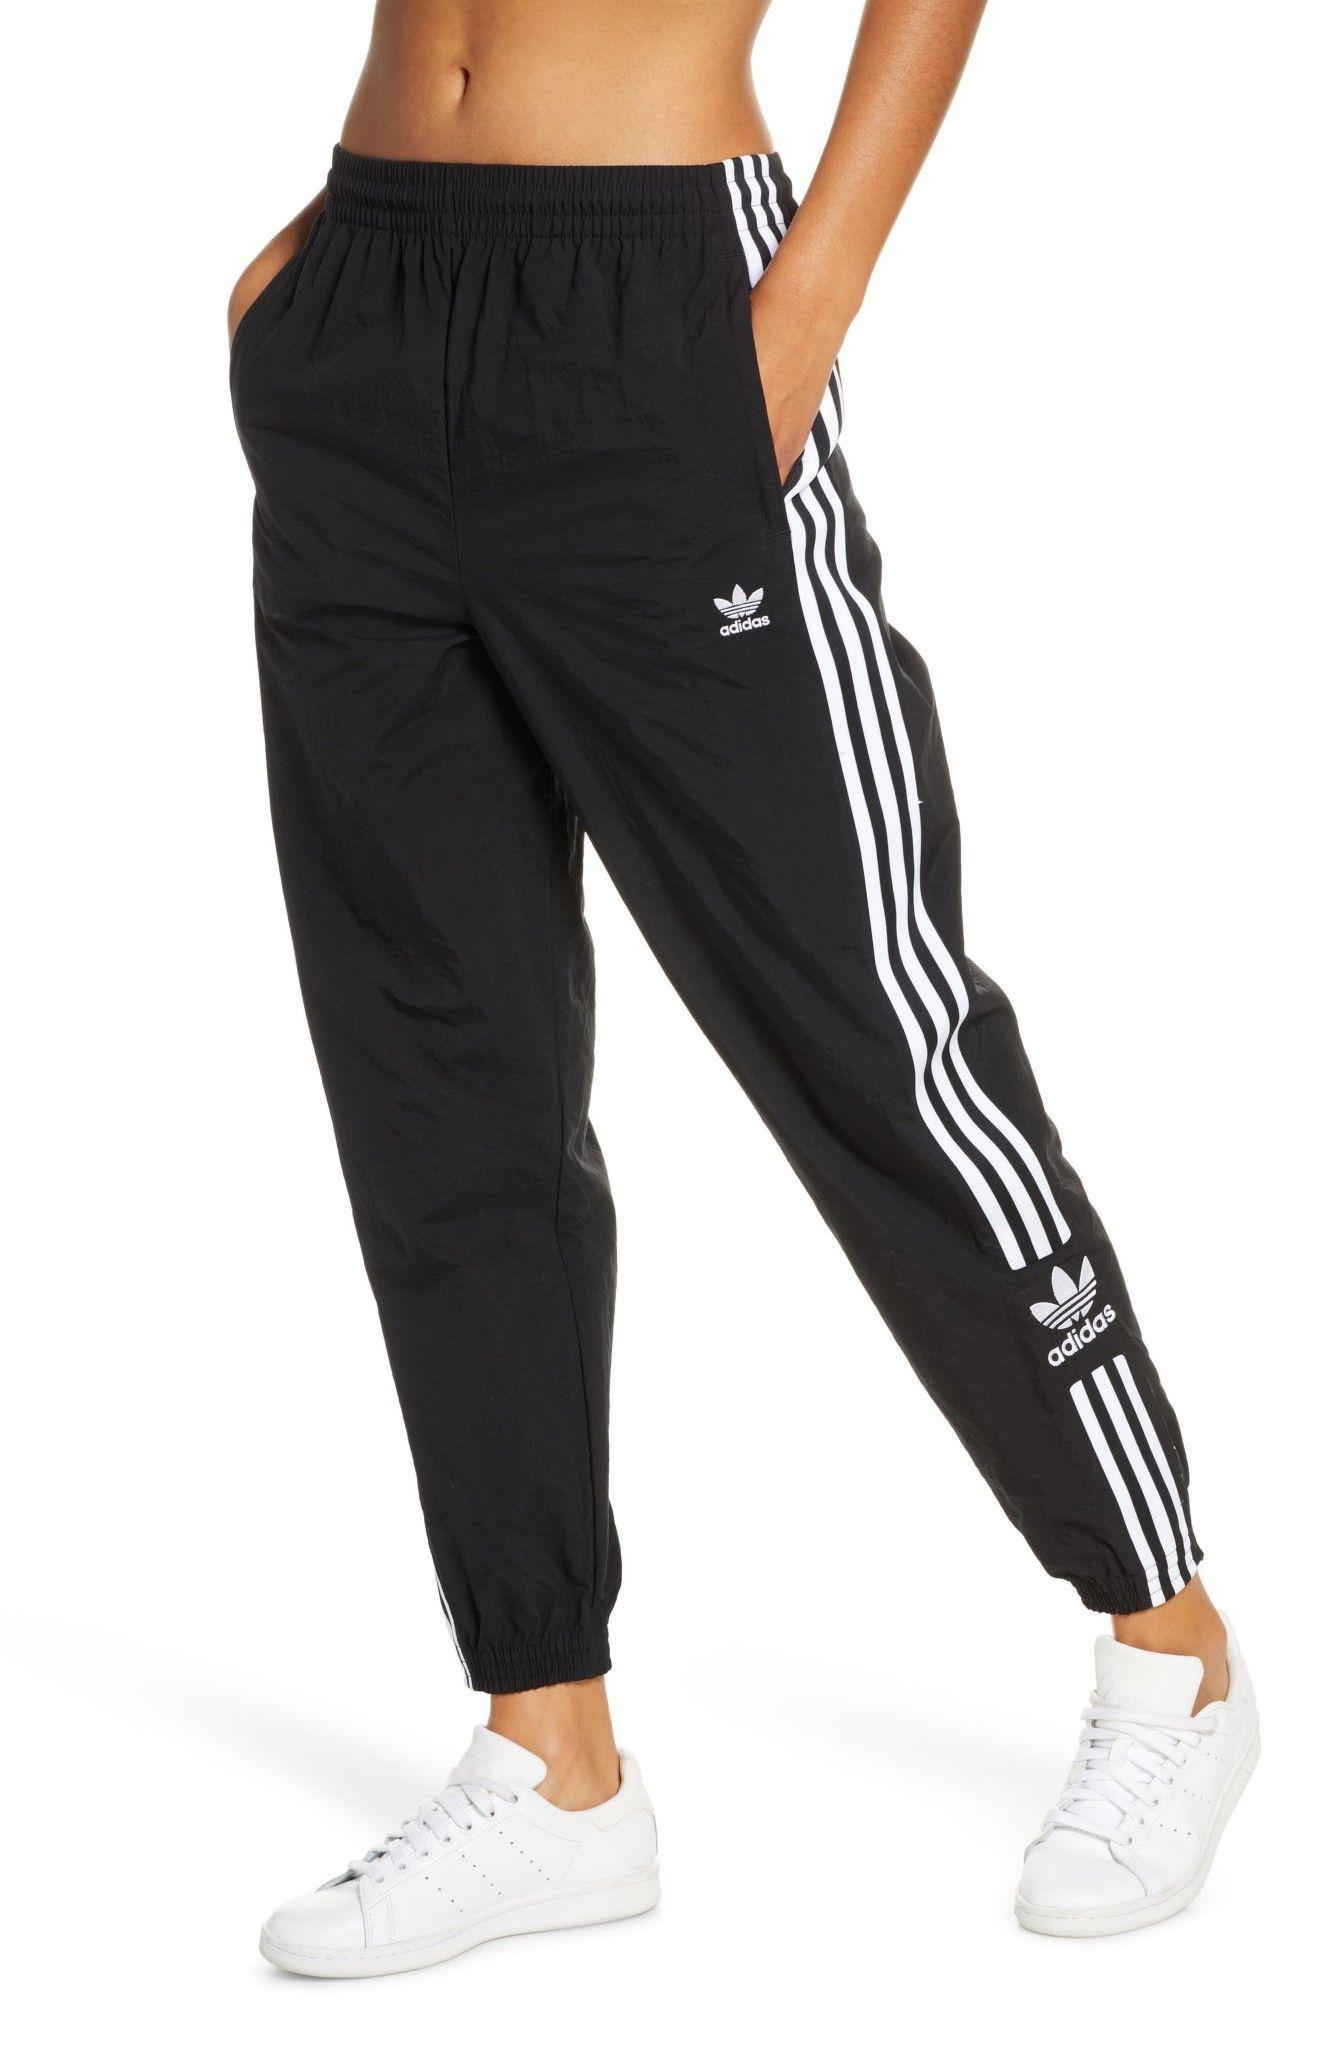 Pants Donna 3 Stripe Woven Training adidas